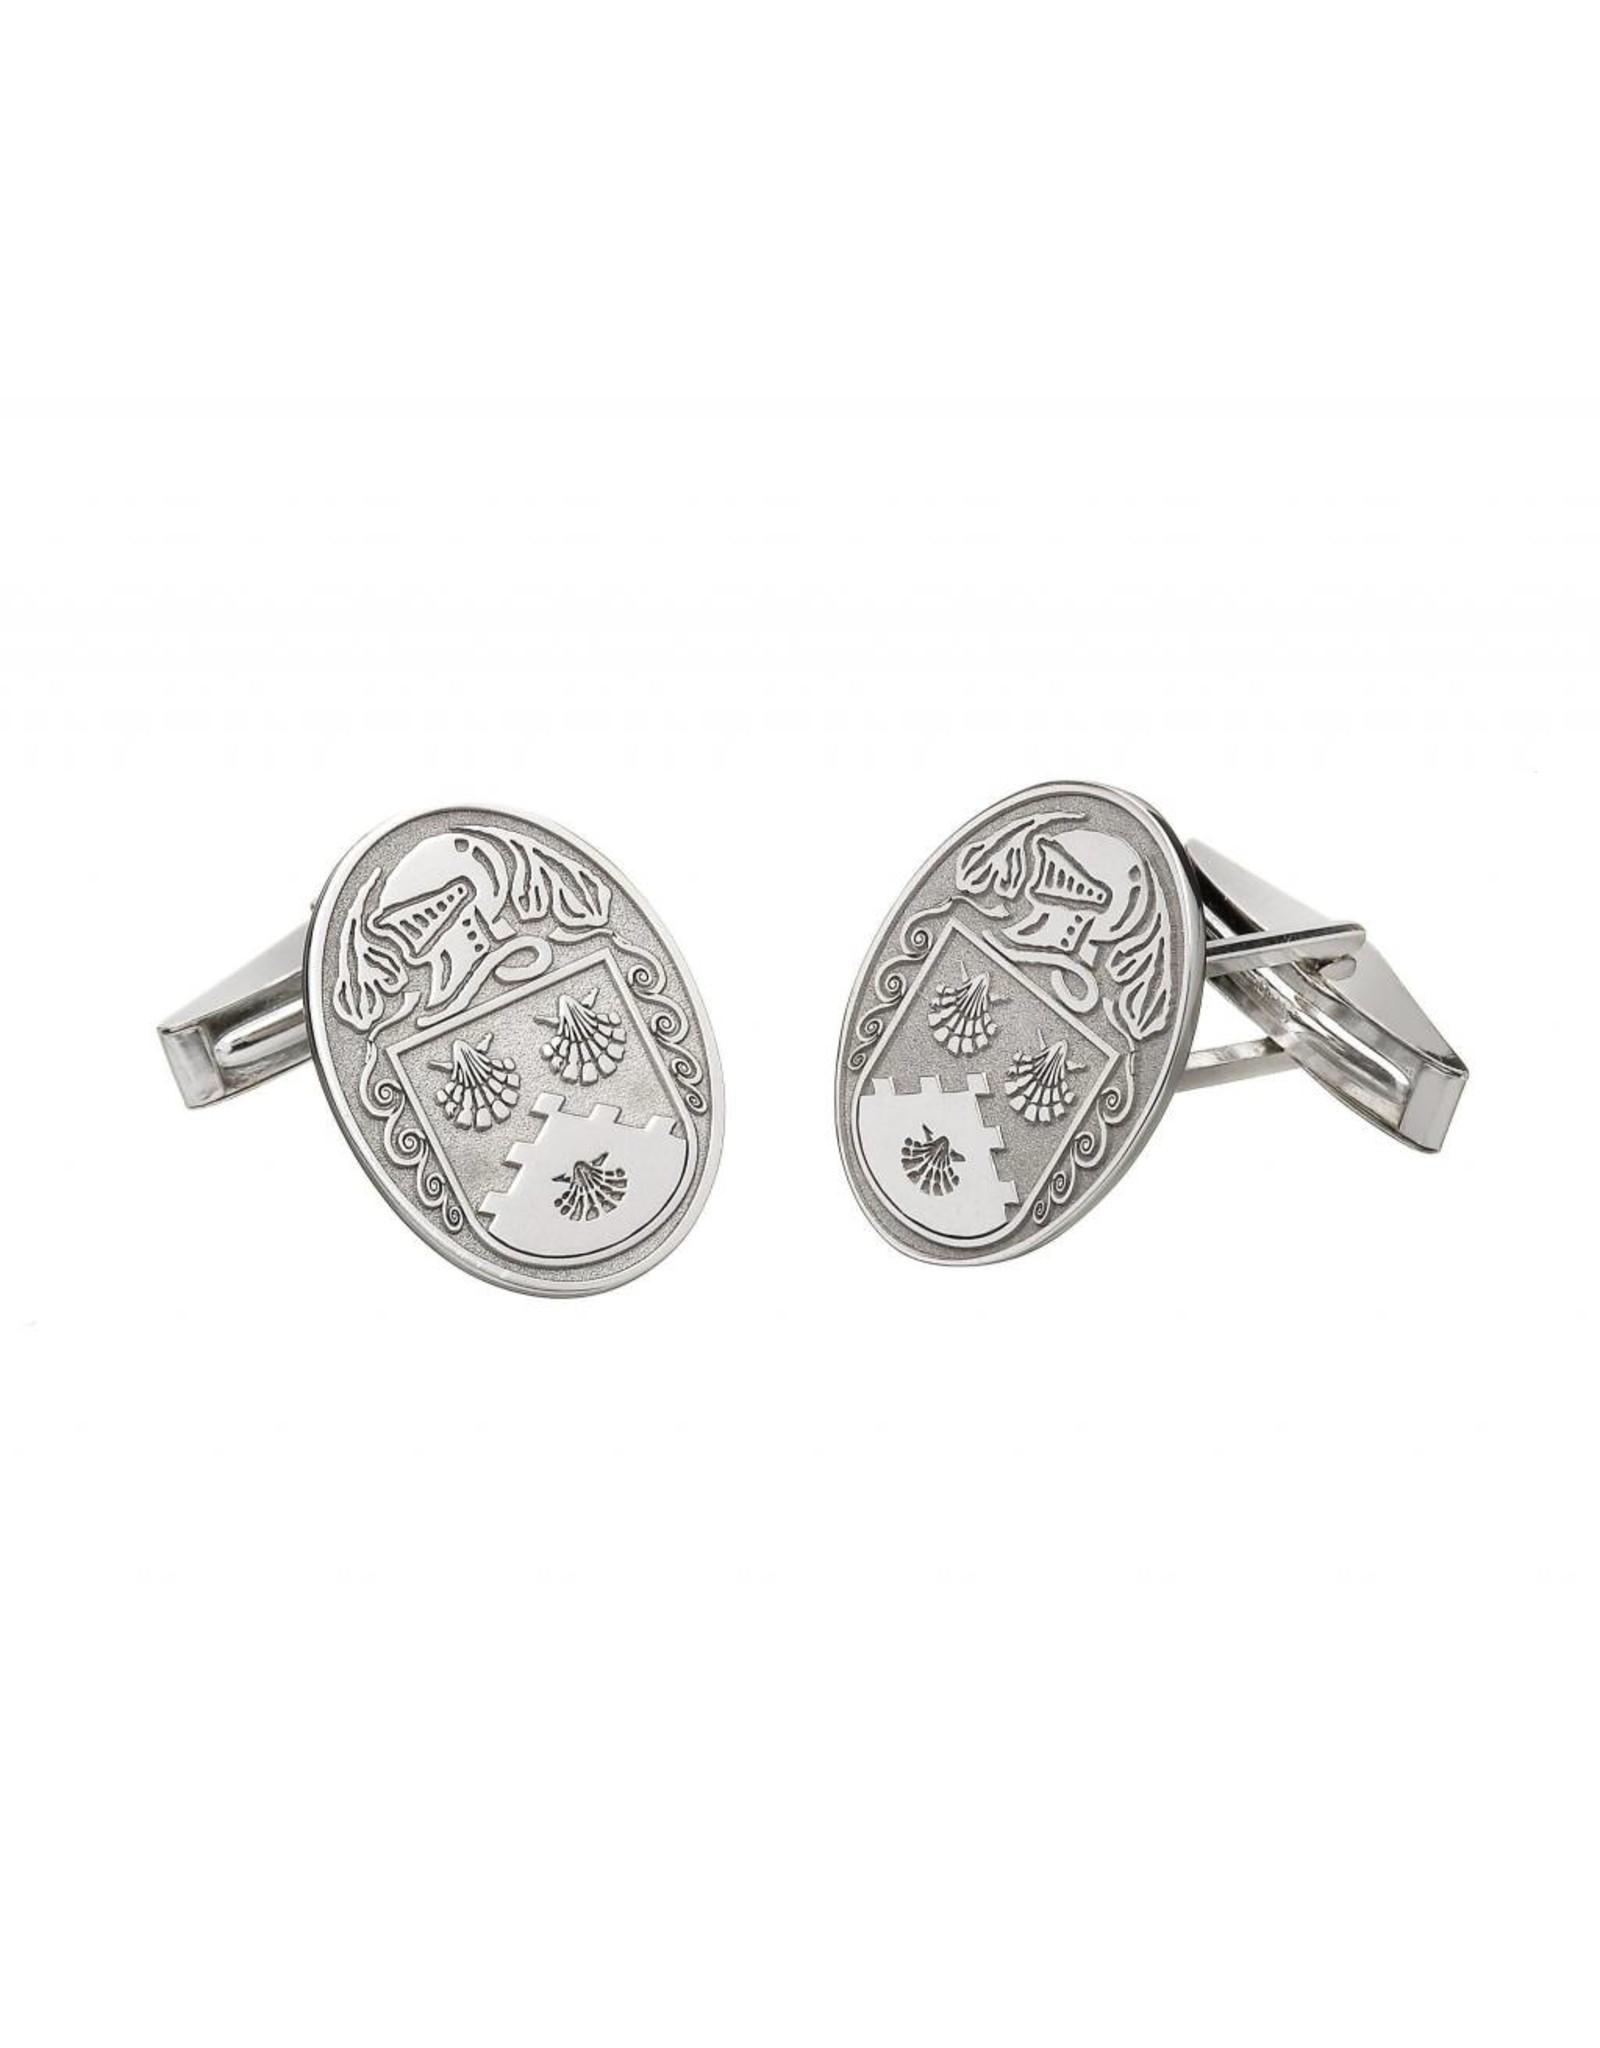 Boru Jewelry Large Oval Shaped Coat of Arms Cufflinks